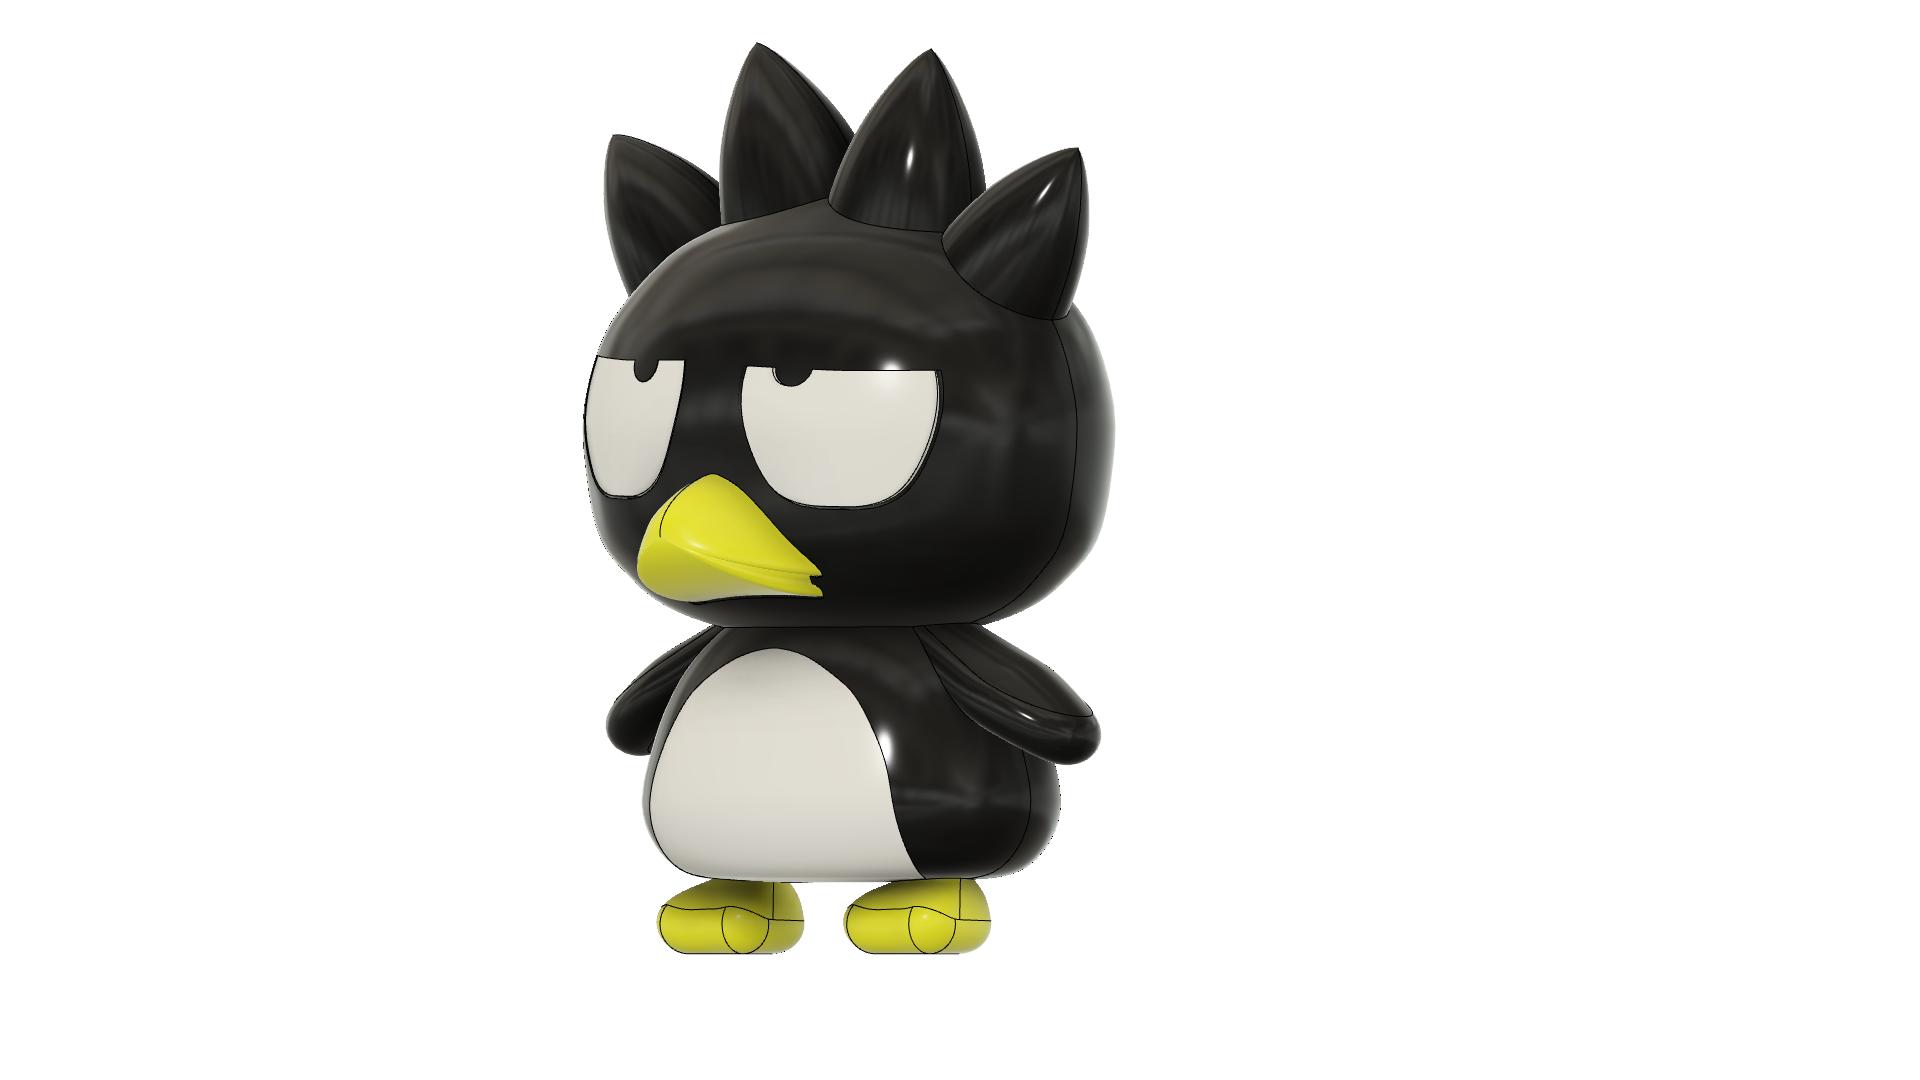 Badtz-Maru_v13.png Download free STL file Badtz-Maru (バッドばつ丸, Baddo Batsu Maru) • 3D printable design, Jangie